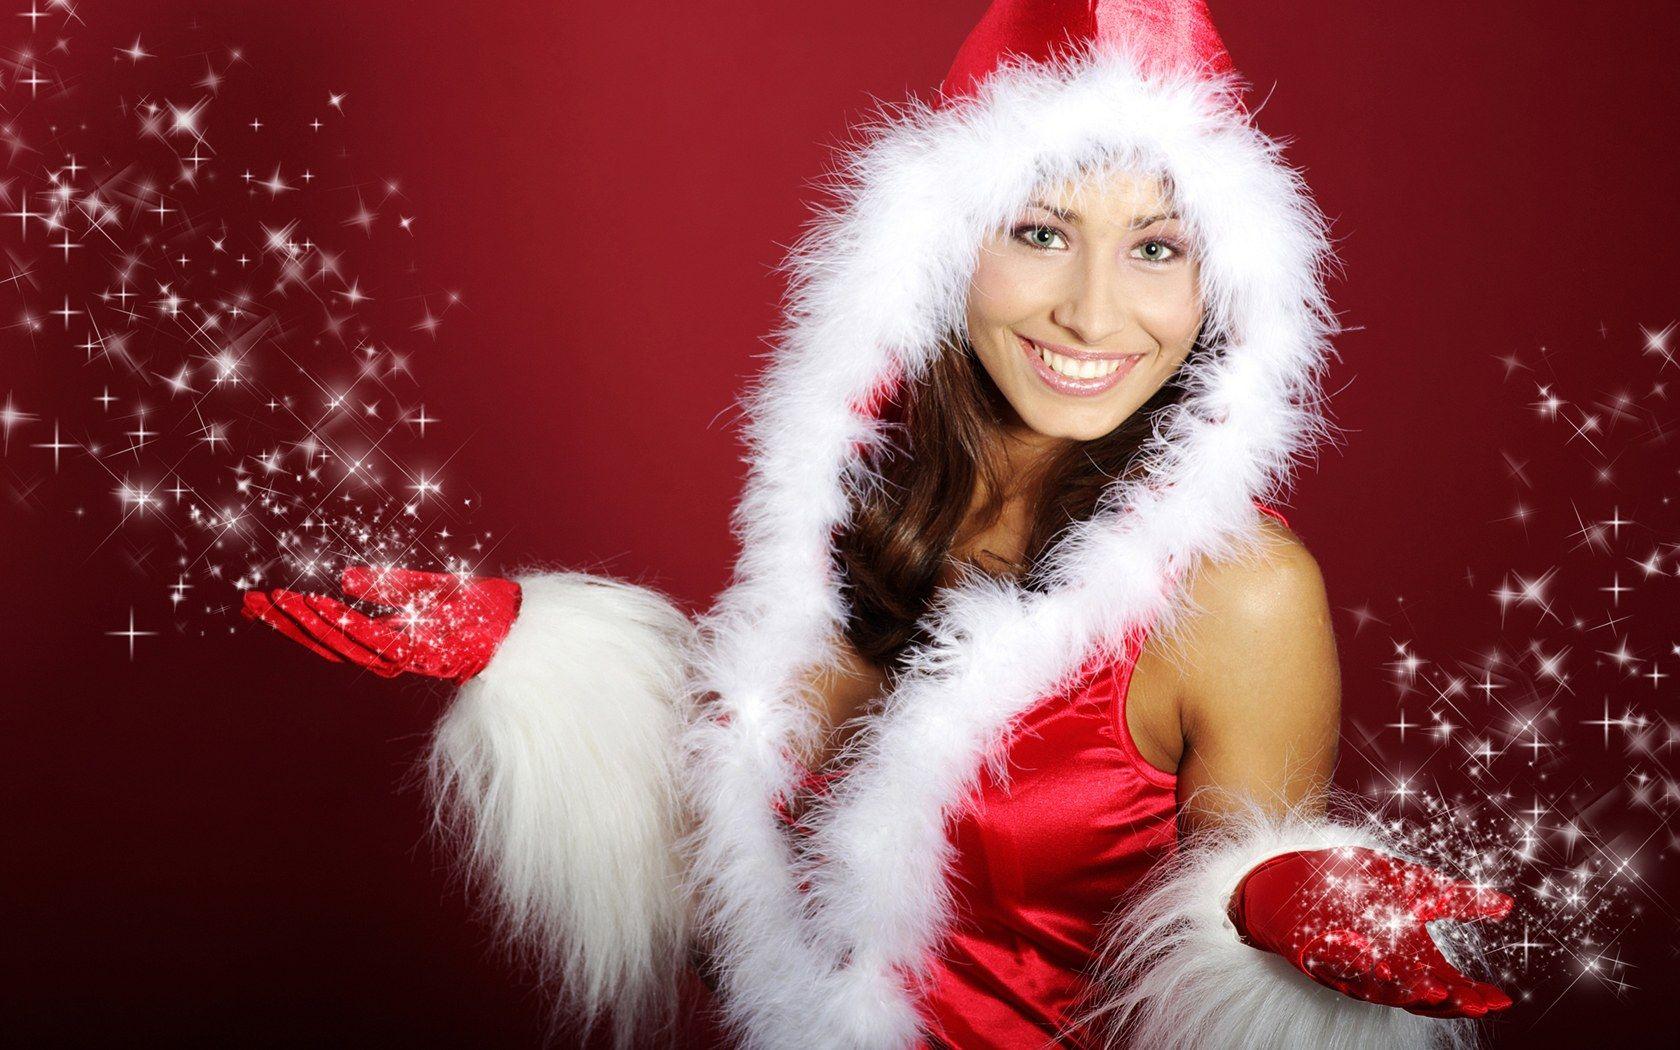 Santa s Daughter has some of the old Xmas Magic